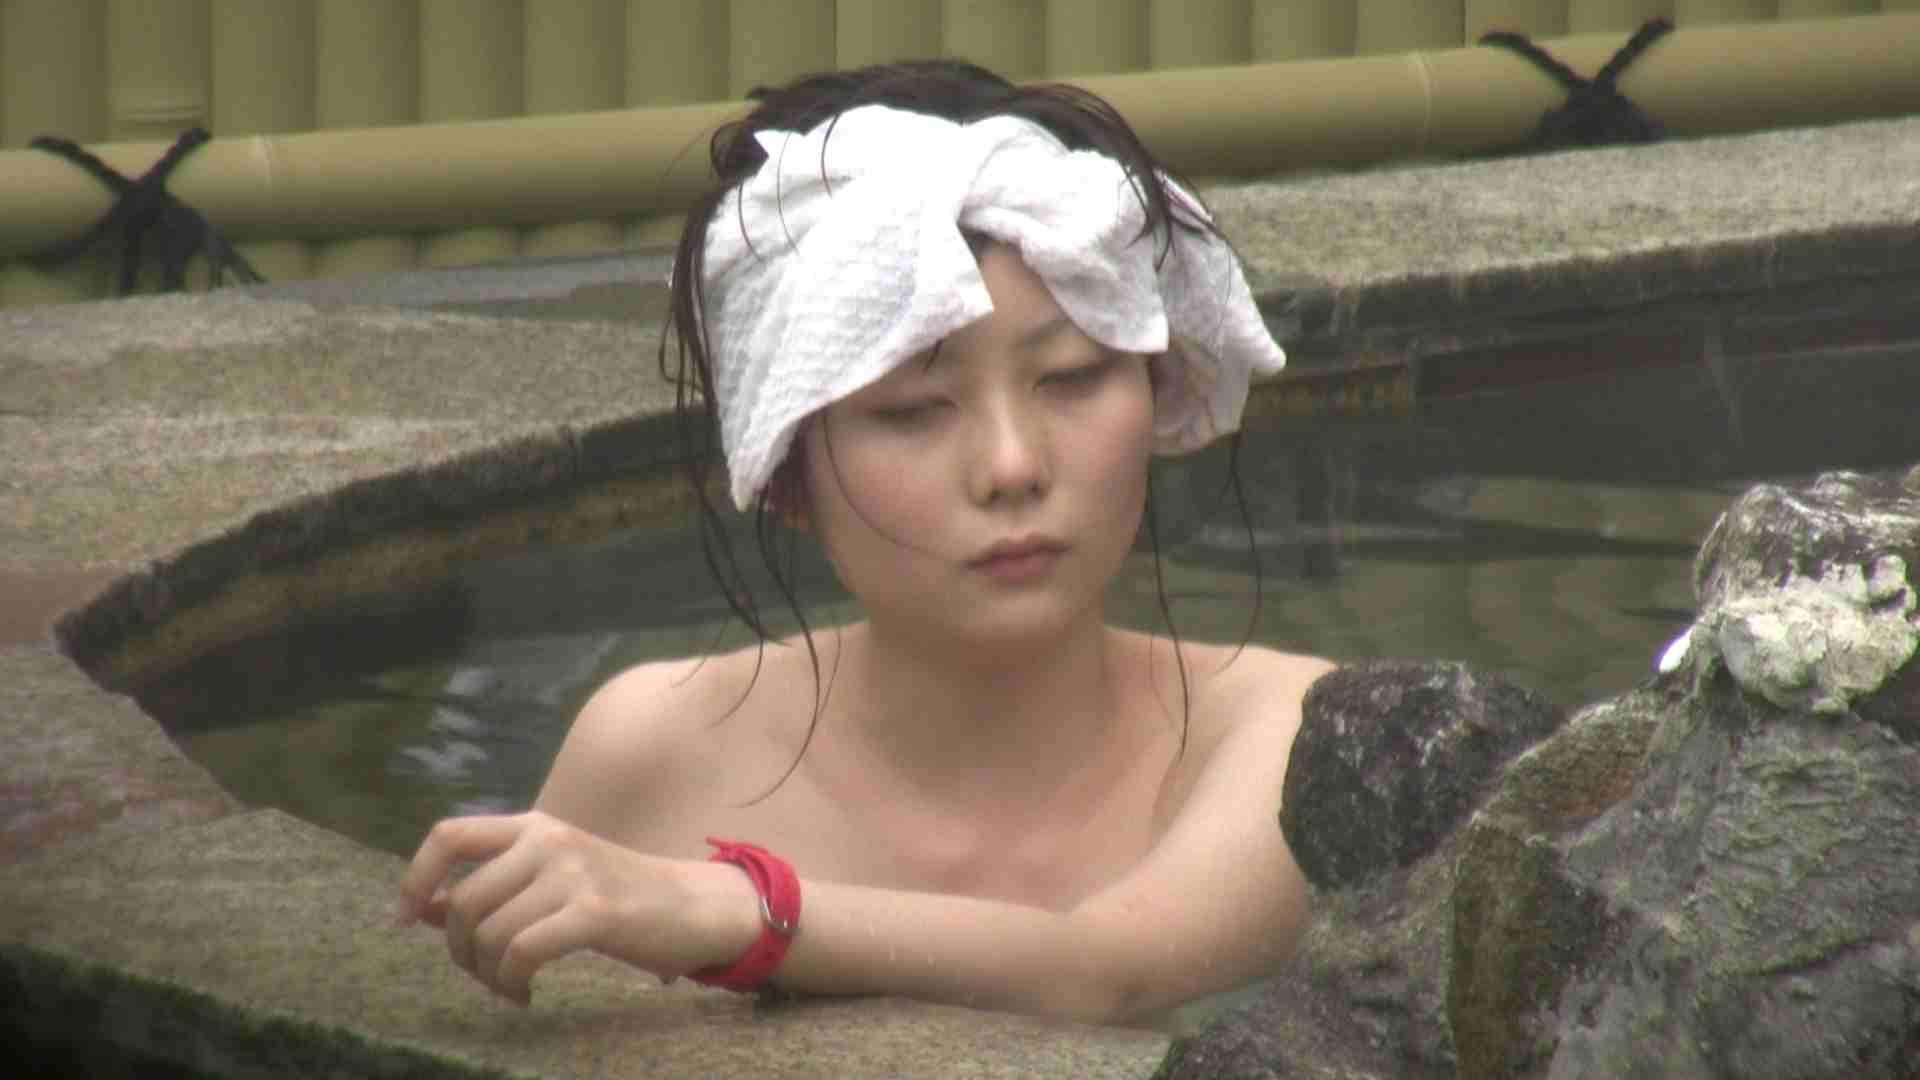 Aquaな露天風呂Vol.147 綺麗なOLたち アダルト動画キャプチャ 102枚 35